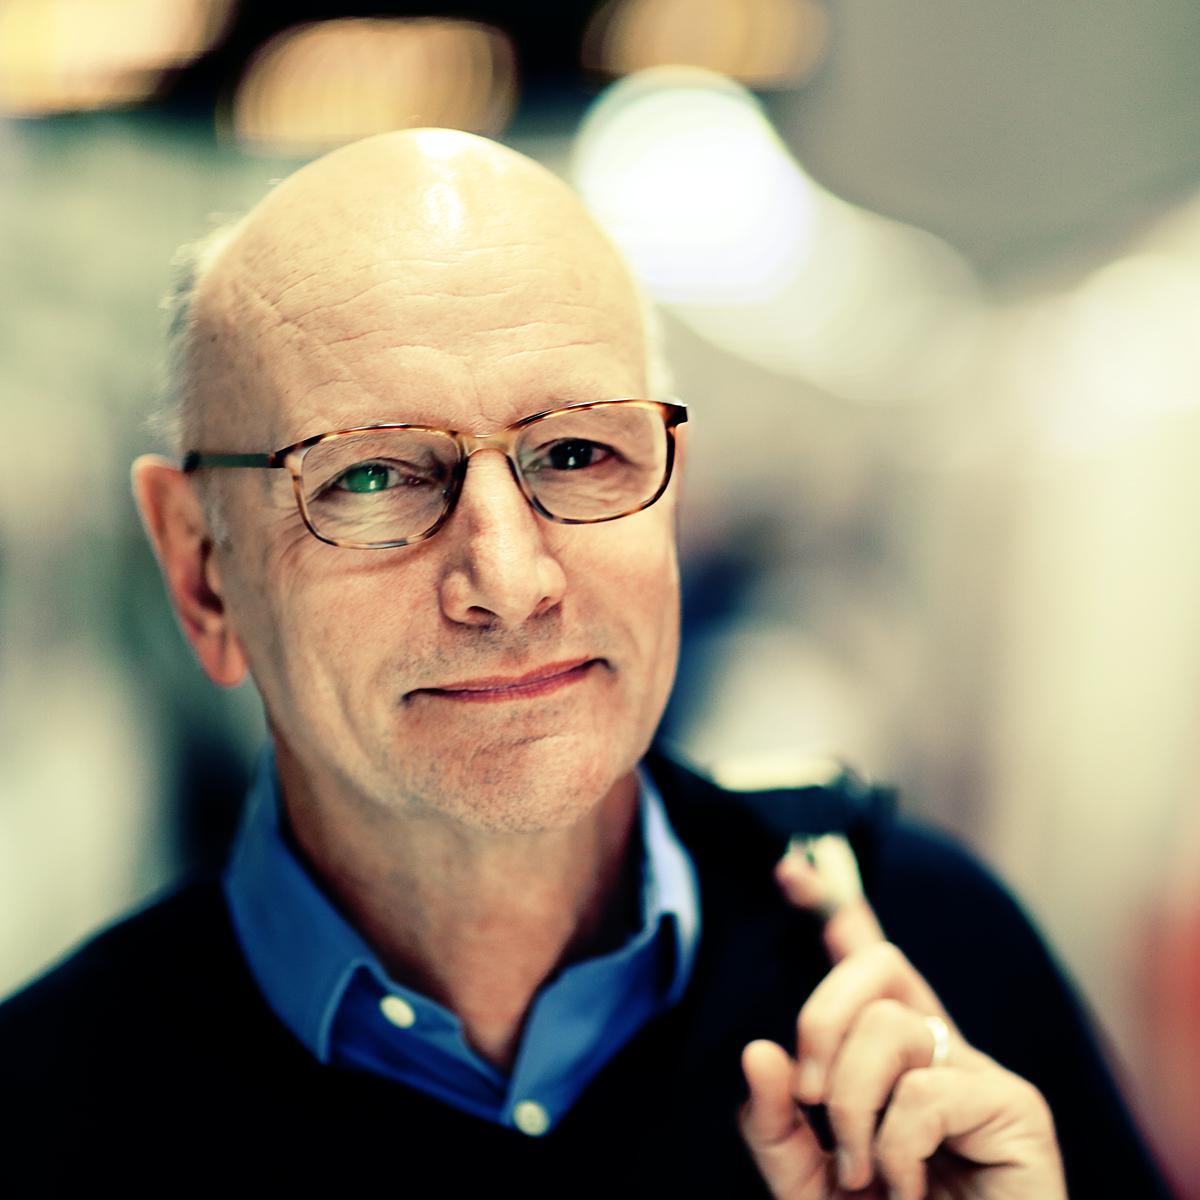 Corporate Linkedin Headshot of Mark Cramphorn by Julian Hanford, London